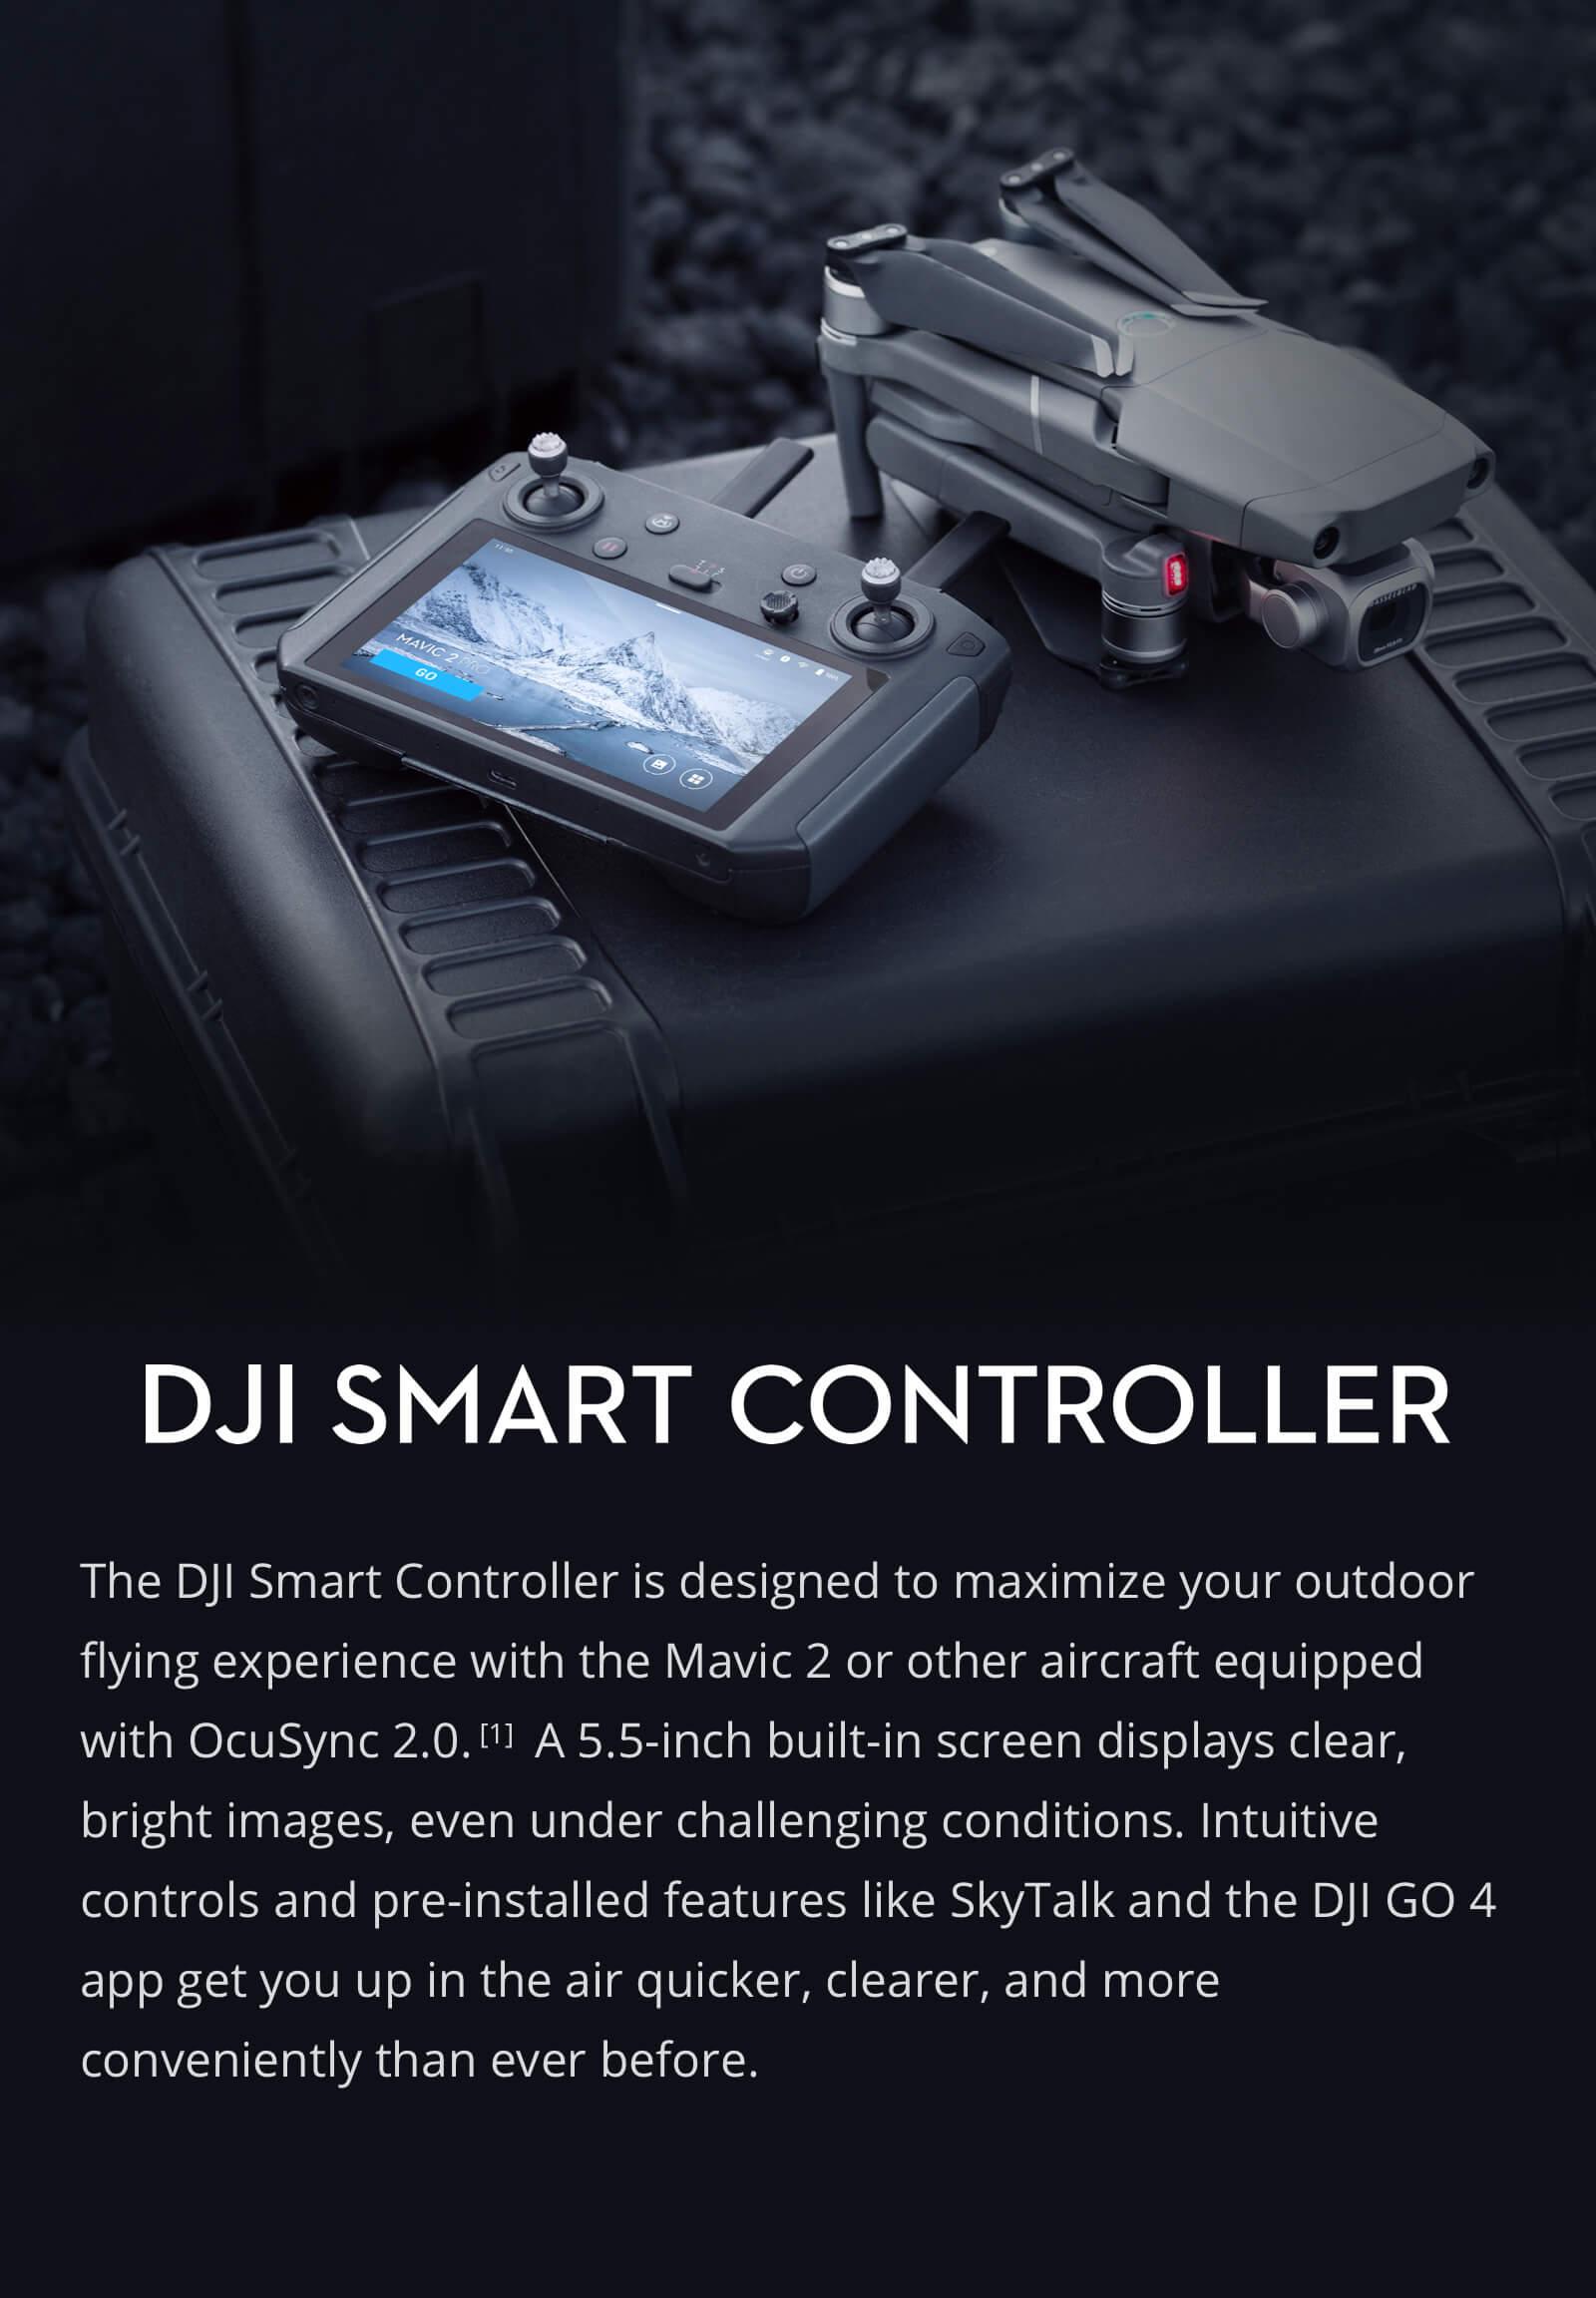 1djismartcontroller.jpg